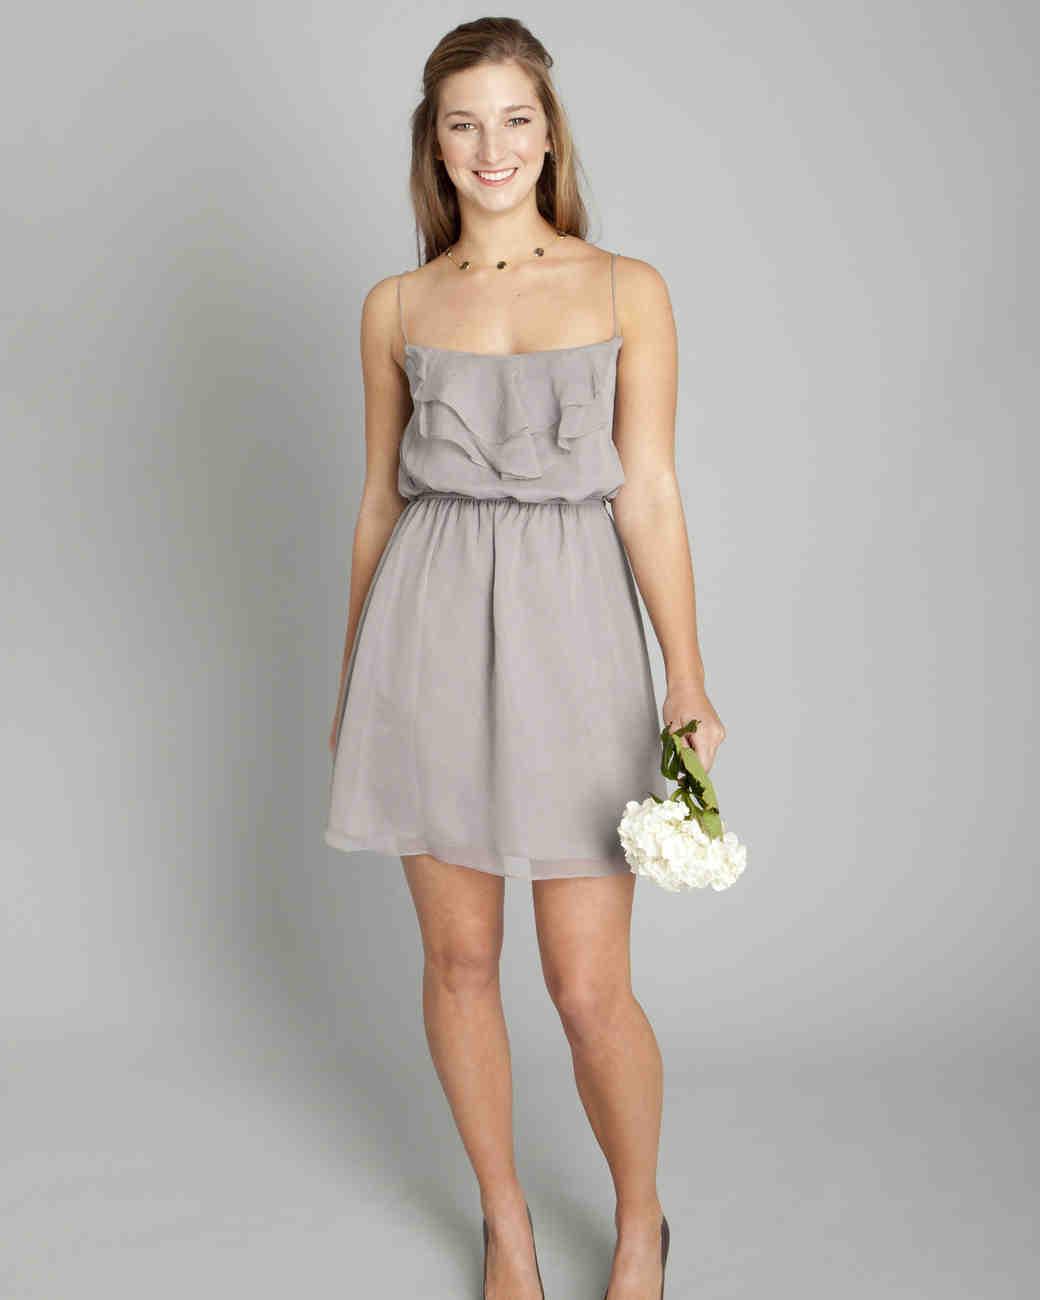 bridesmaid dresses beach weddings beach dresses for weddings Coren Moore